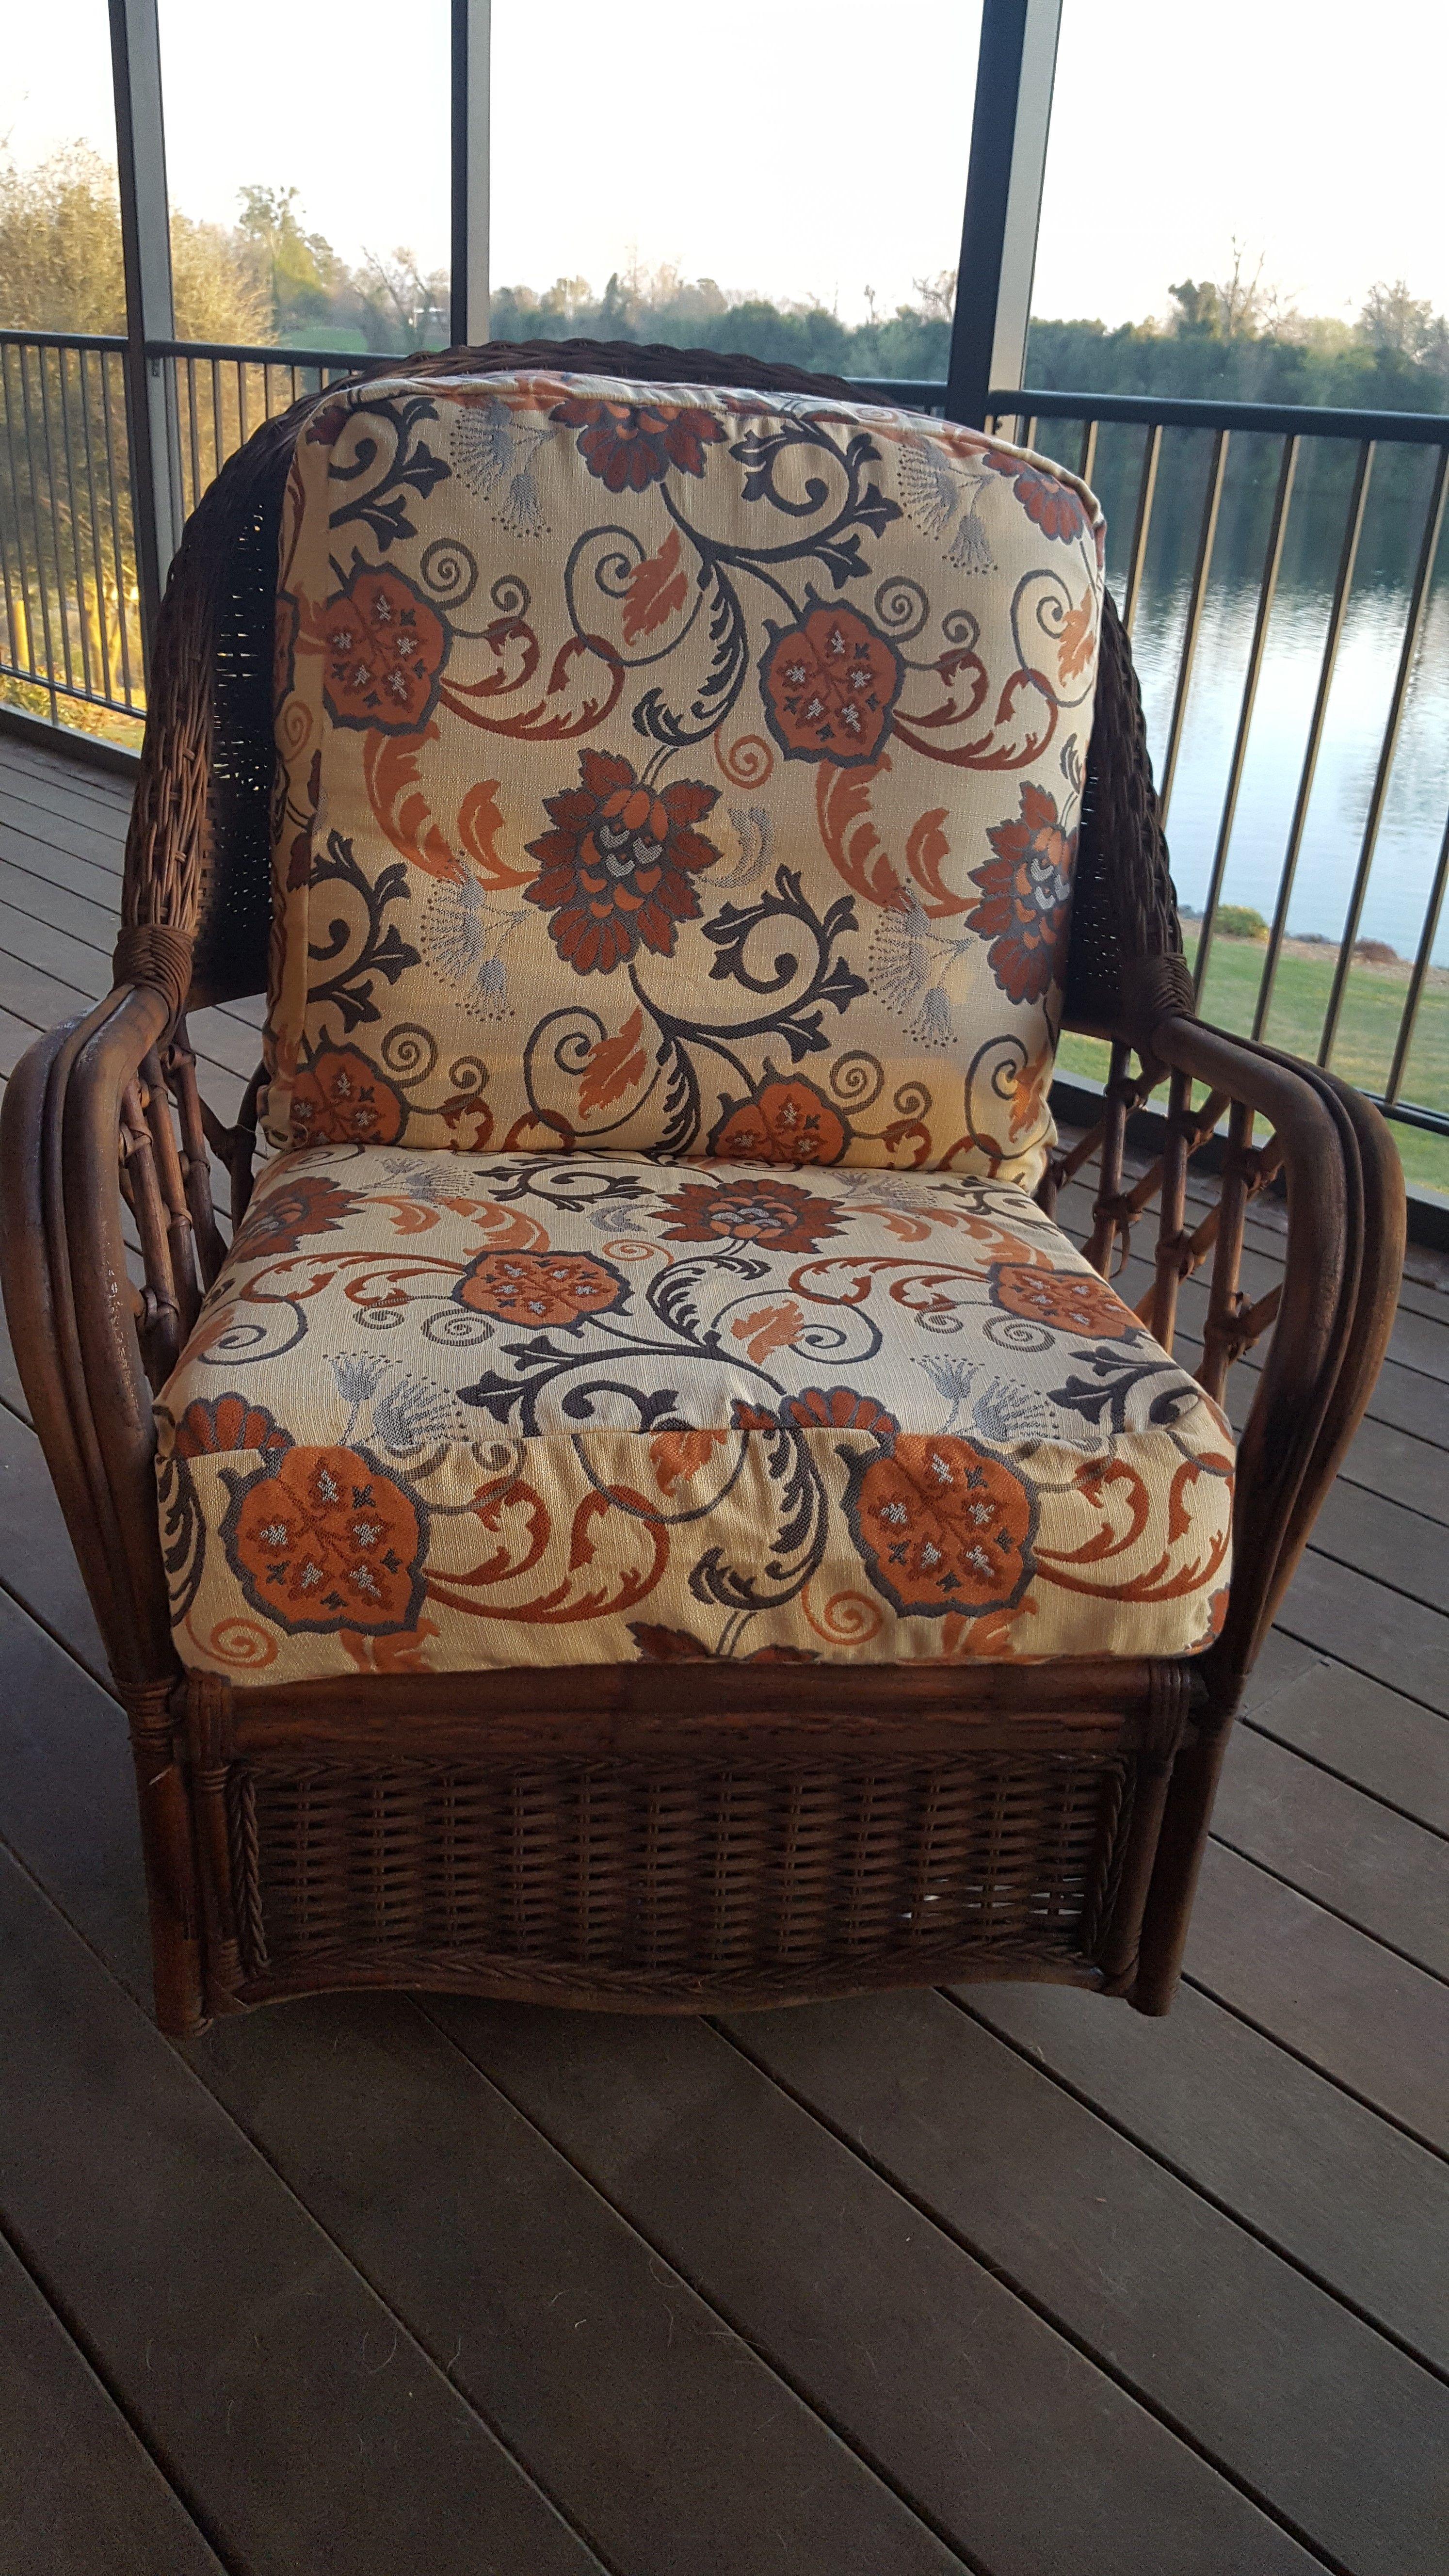 Patio Cushions Outdoor Fabric